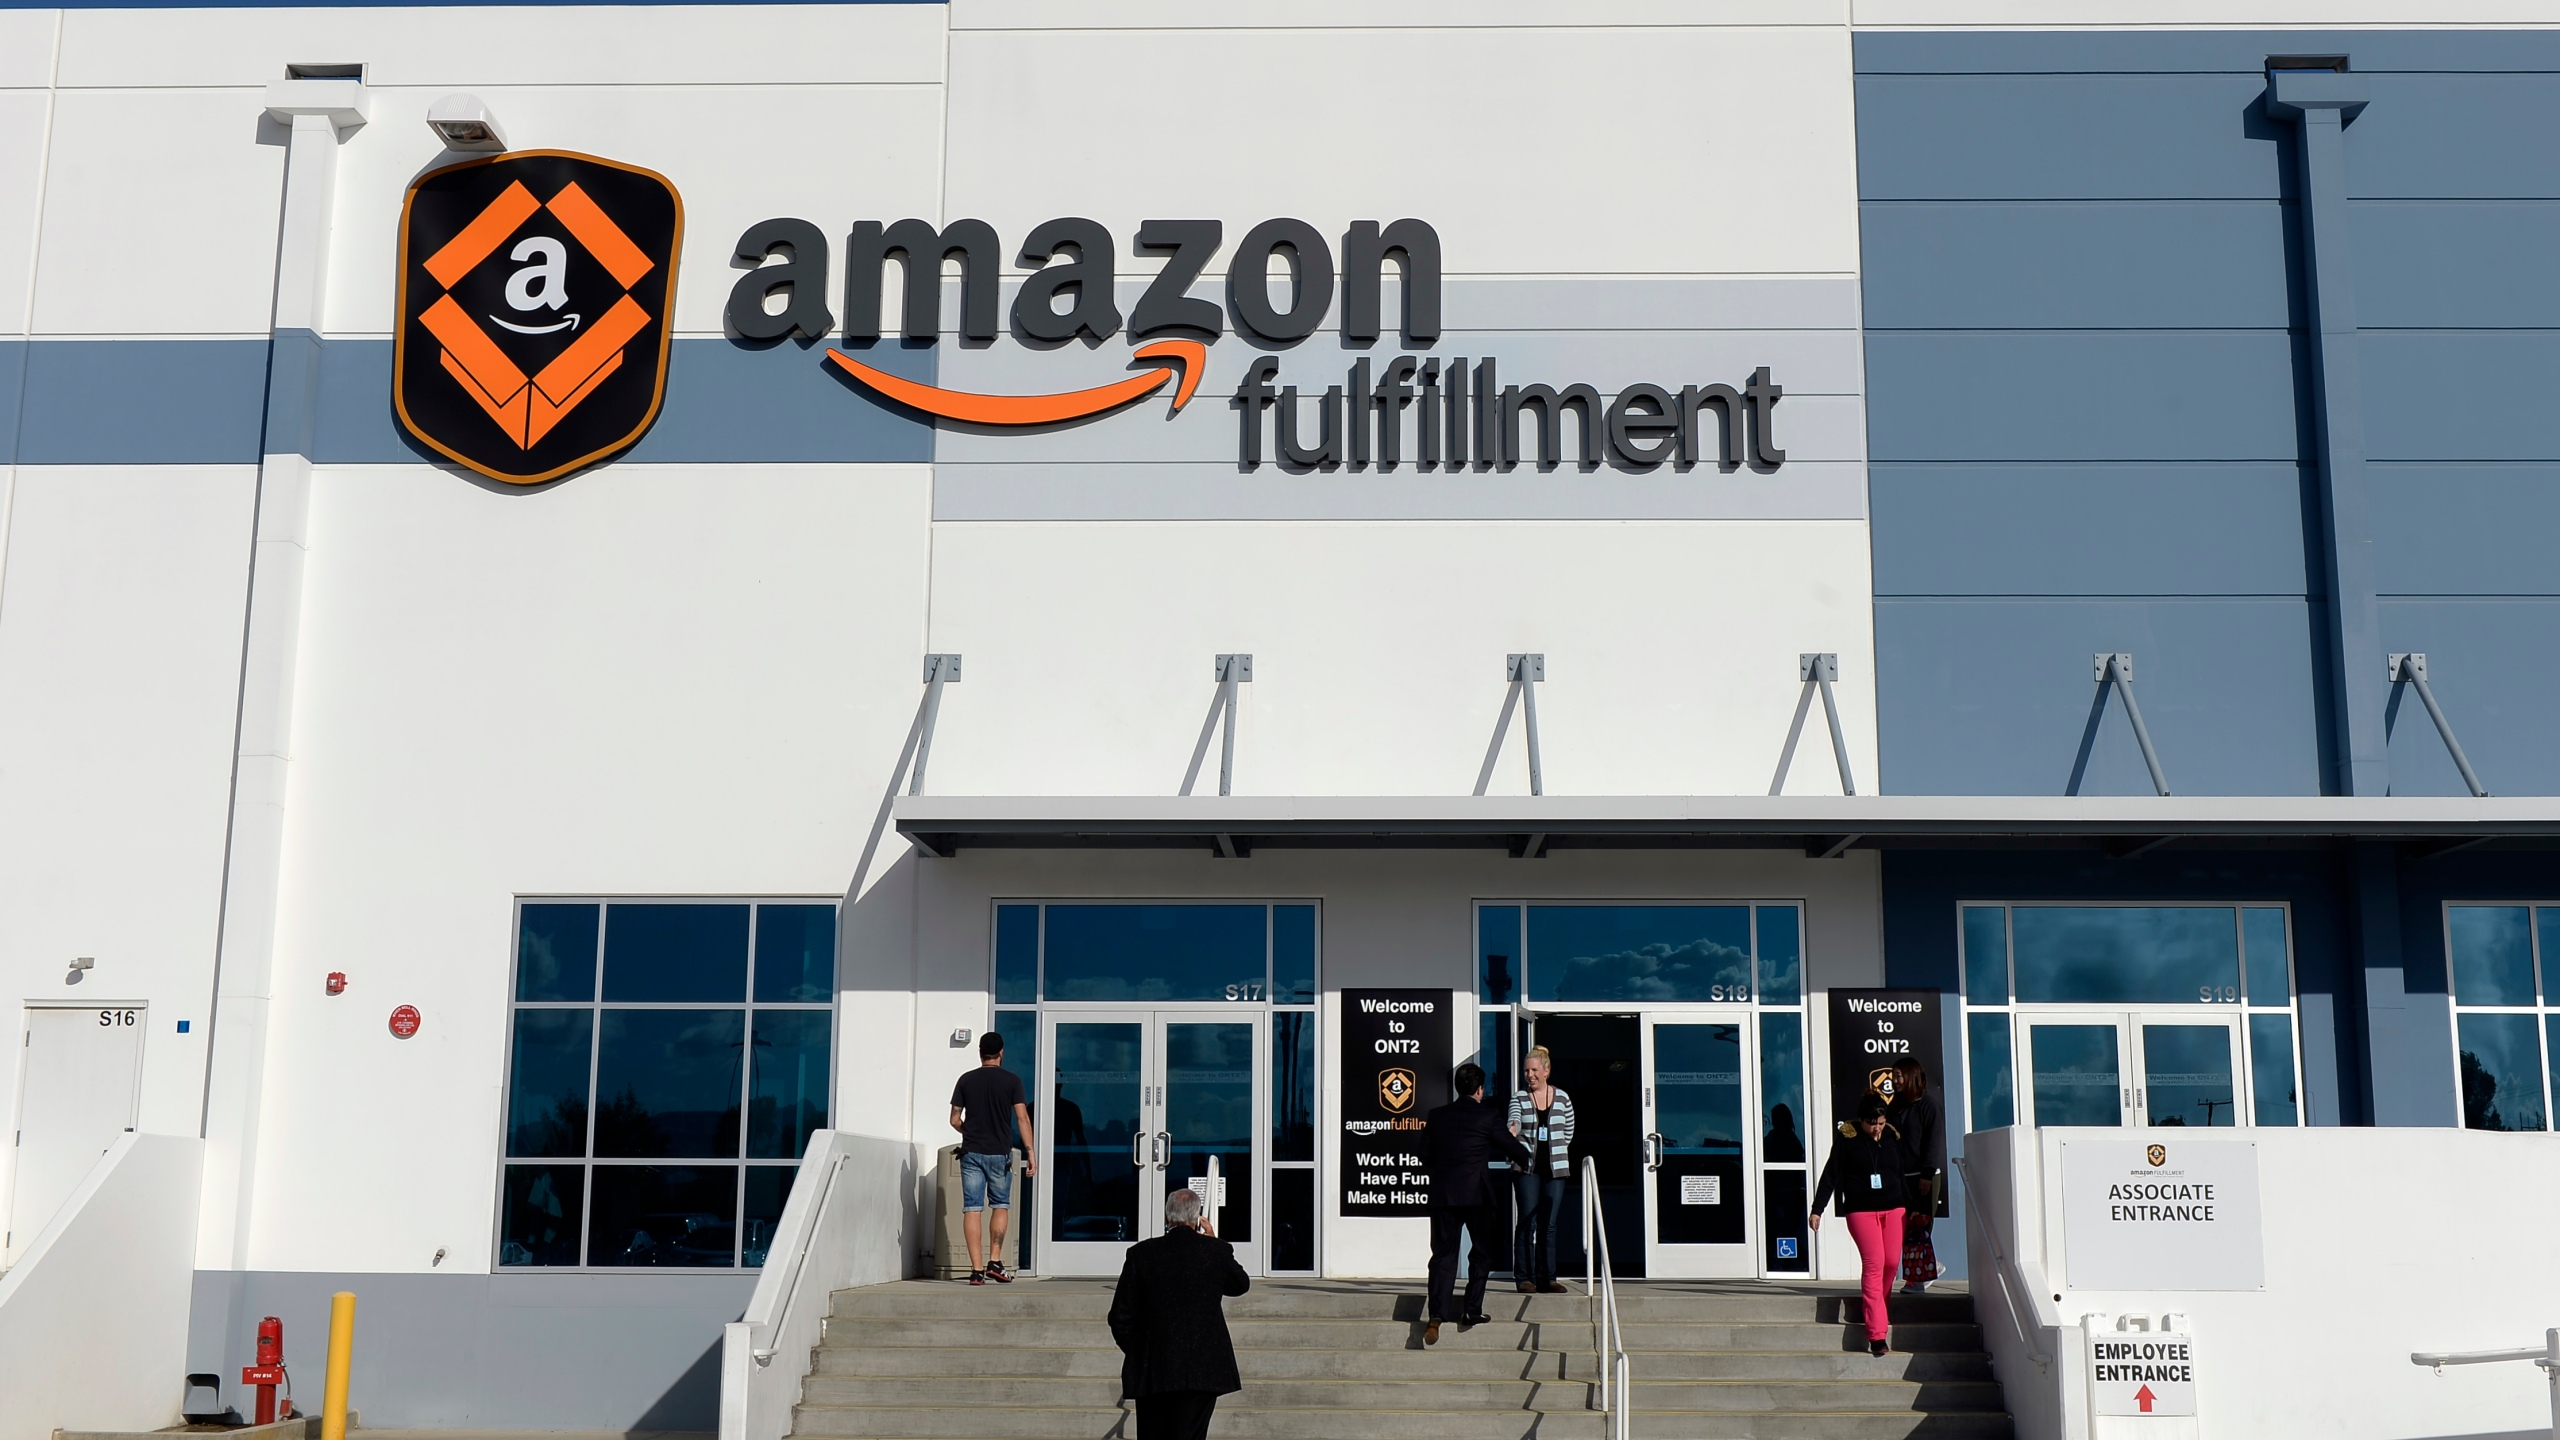 Employees arrive at Amazon's San Bernardino Fulfillment Center October 29, 2013 in San Bernardino. (Kevork Djansezian/Getty Images)